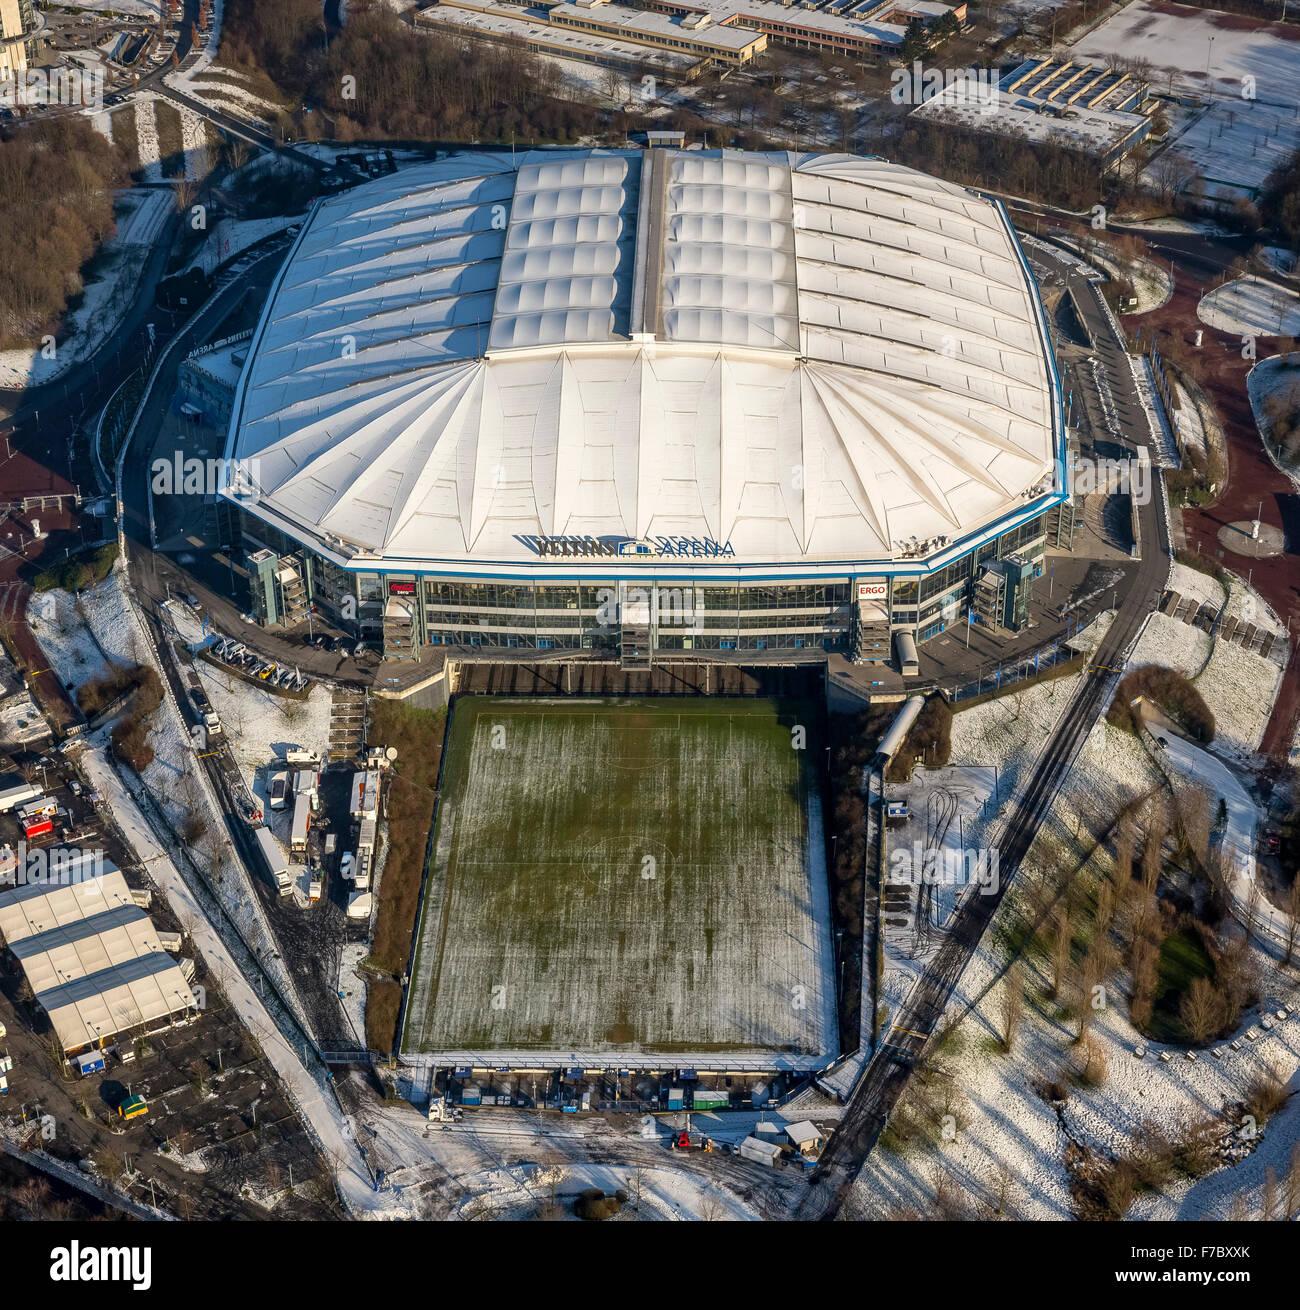 veltins arena in the winter snow schalke stadium s04. Black Bedroom Furniture Sets. Home Design Ideas